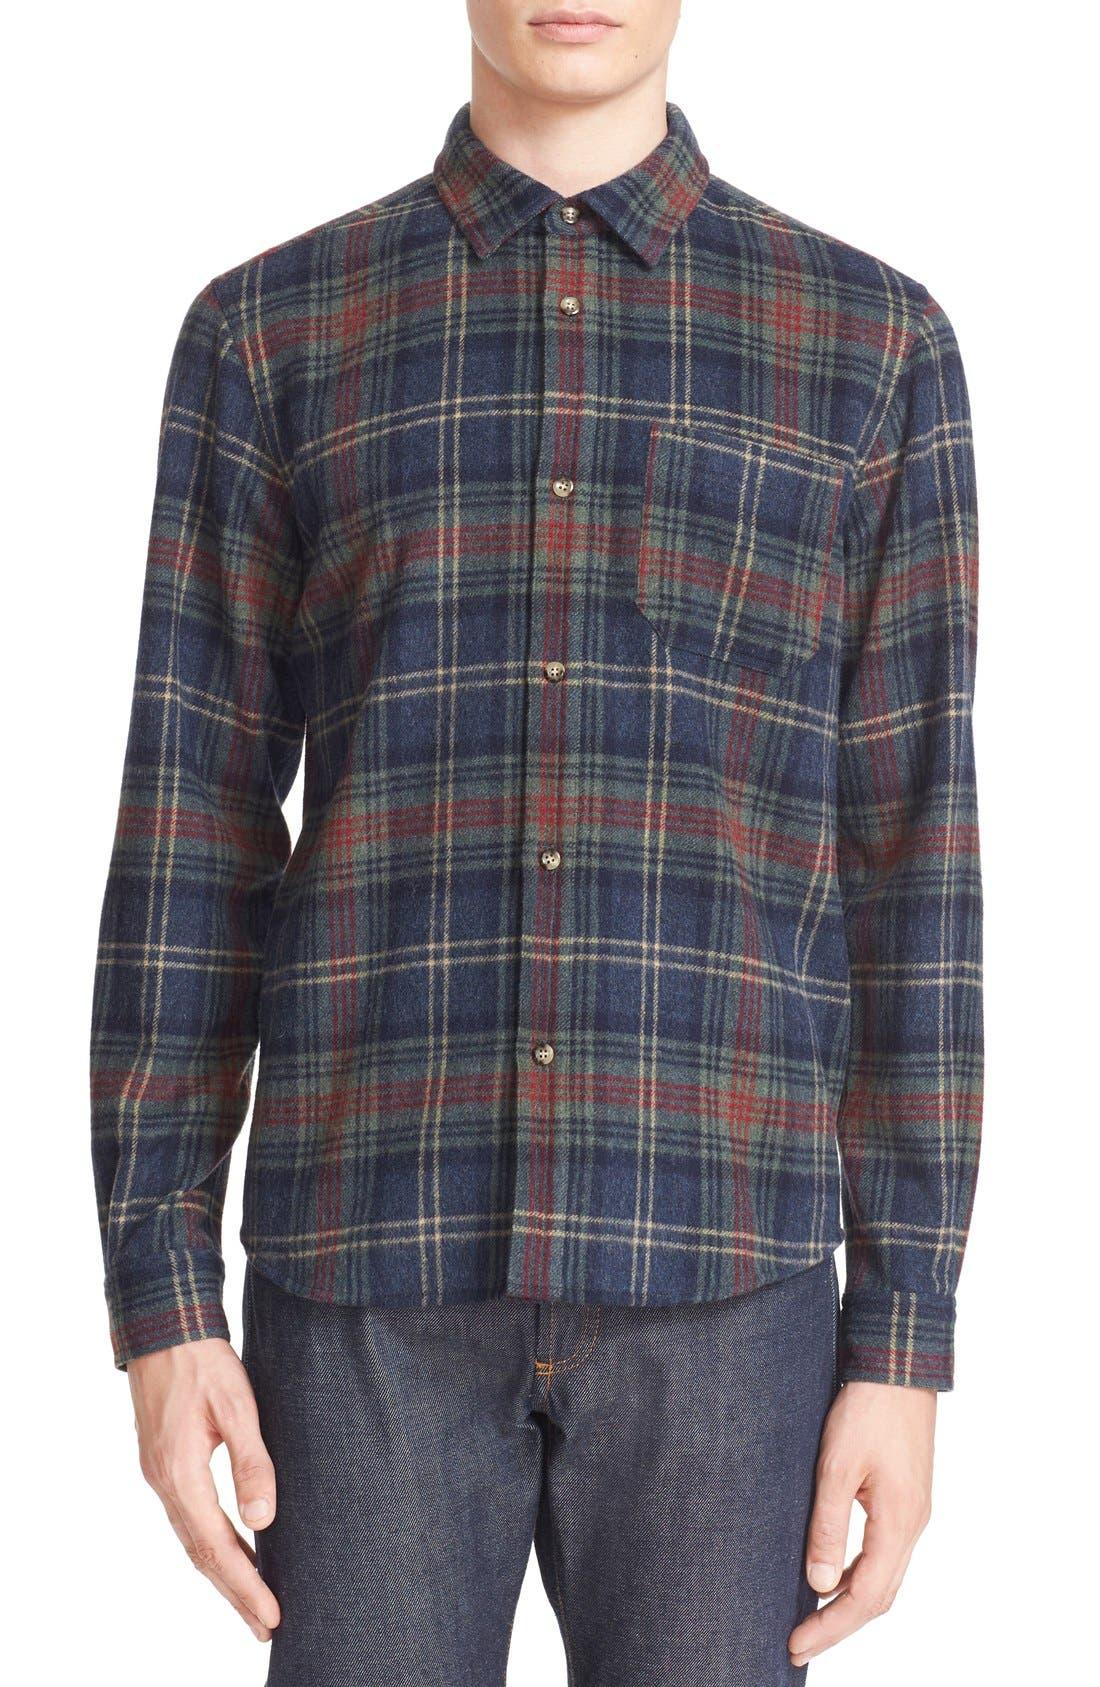 A.P.C. Trevor Plaid Wool Blend Flannel Shirt